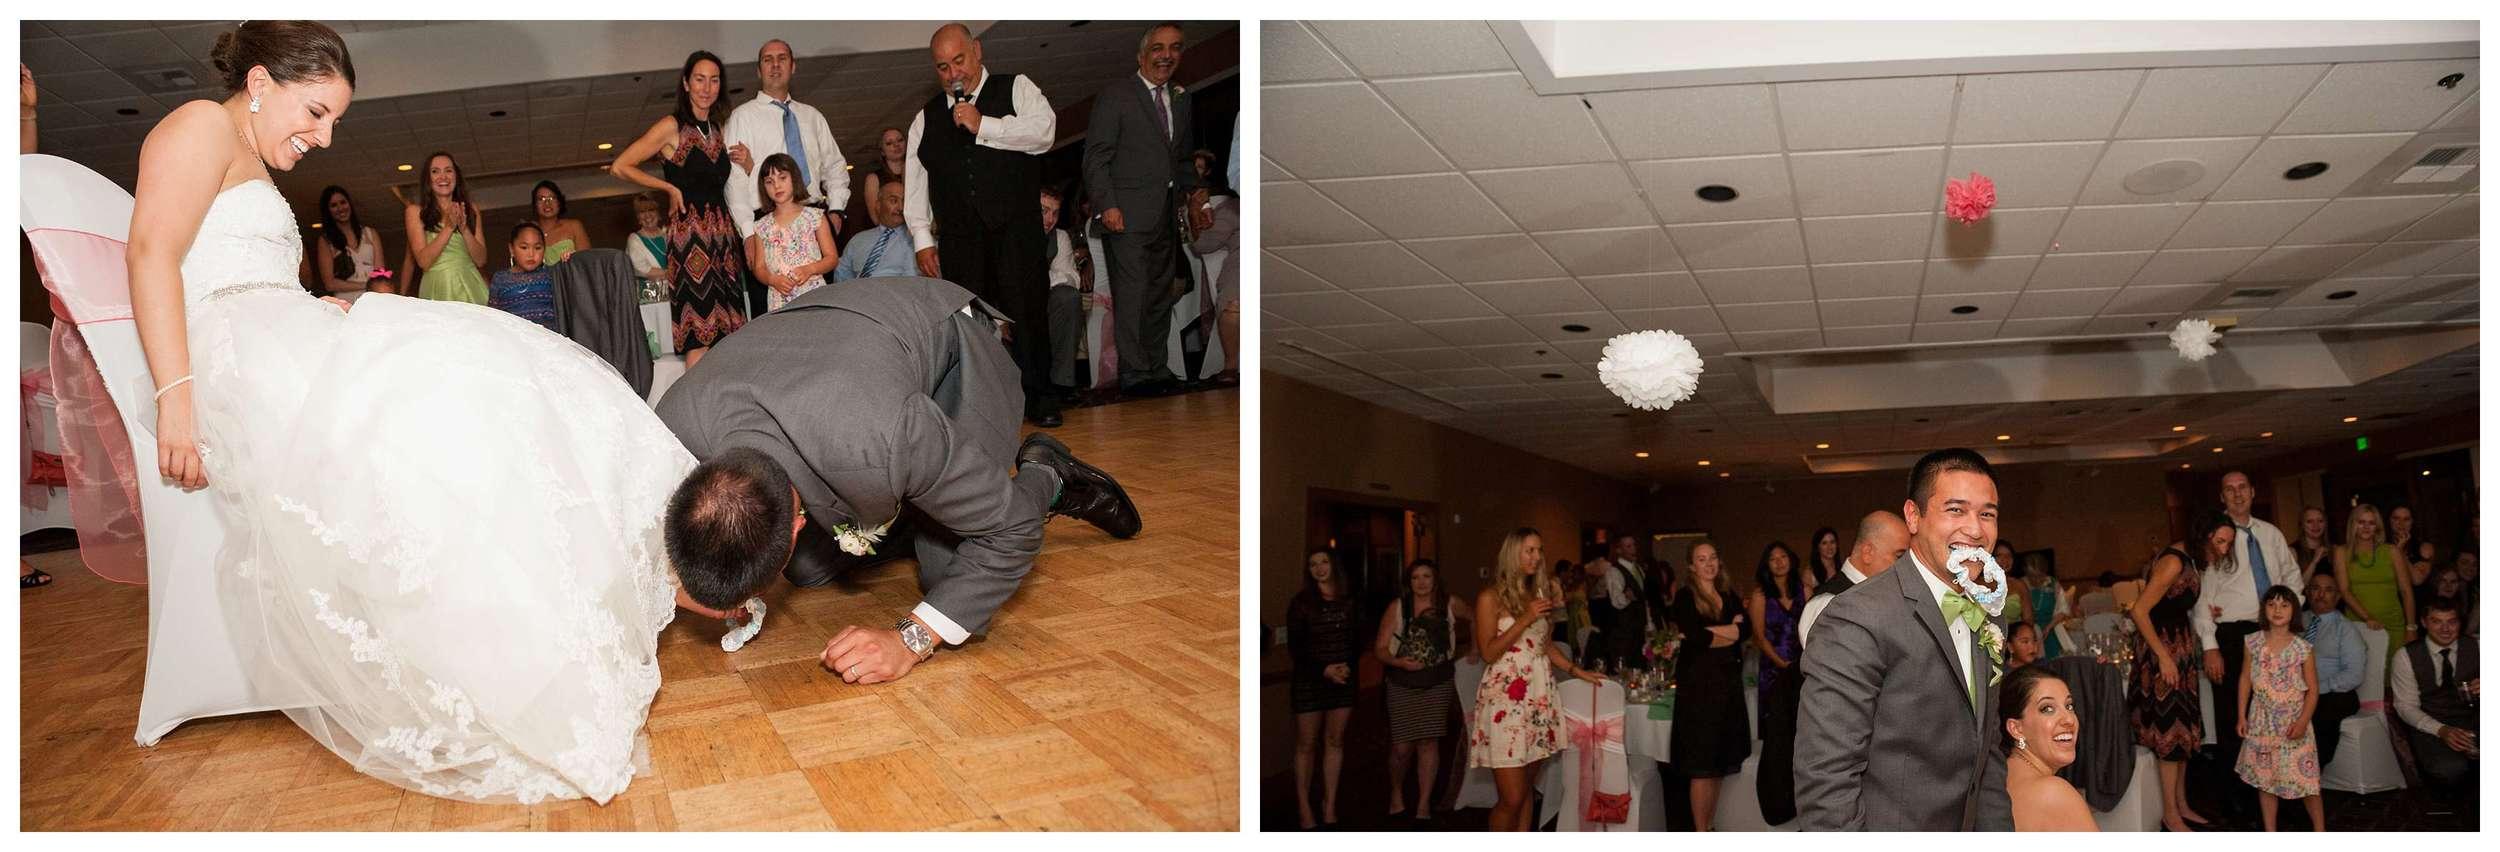 B-Jones-Photography-Seattle-Wedding-Photographer_0898.jpg